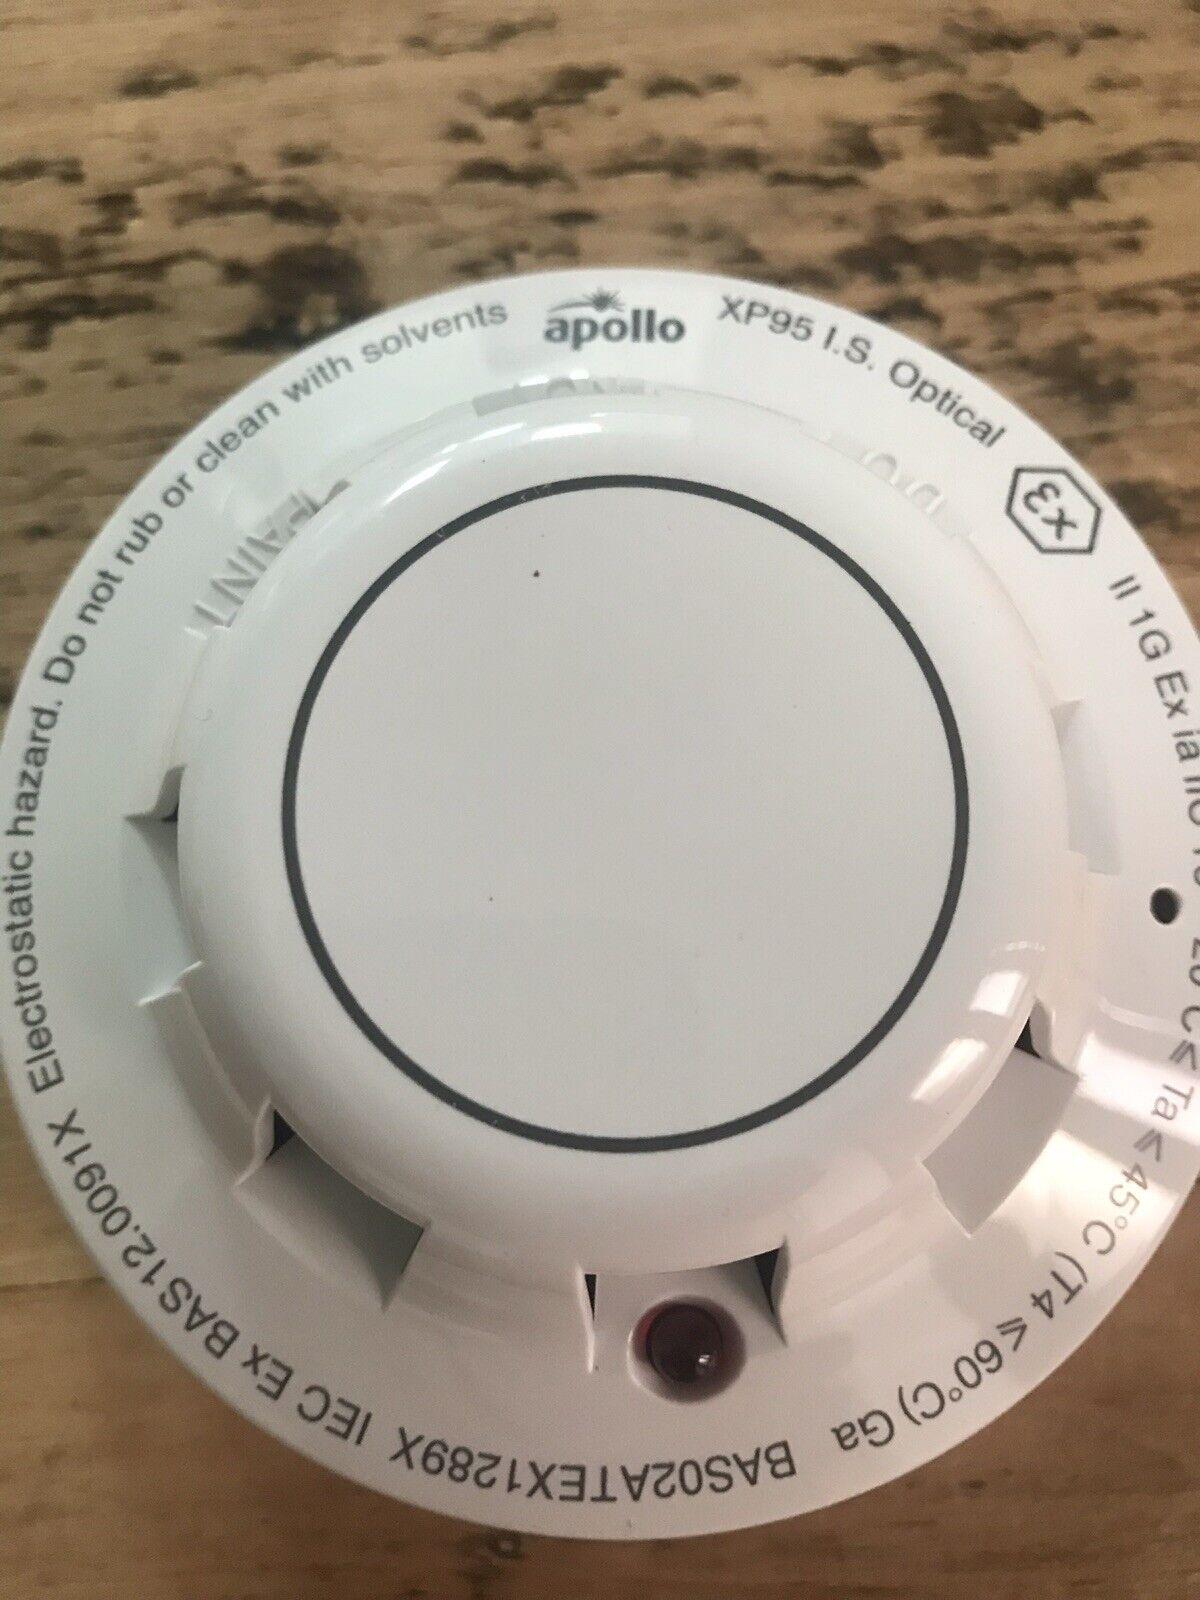 Apollo XP95 55000-540 Detector de humo de ionización intrínsecamente seguro